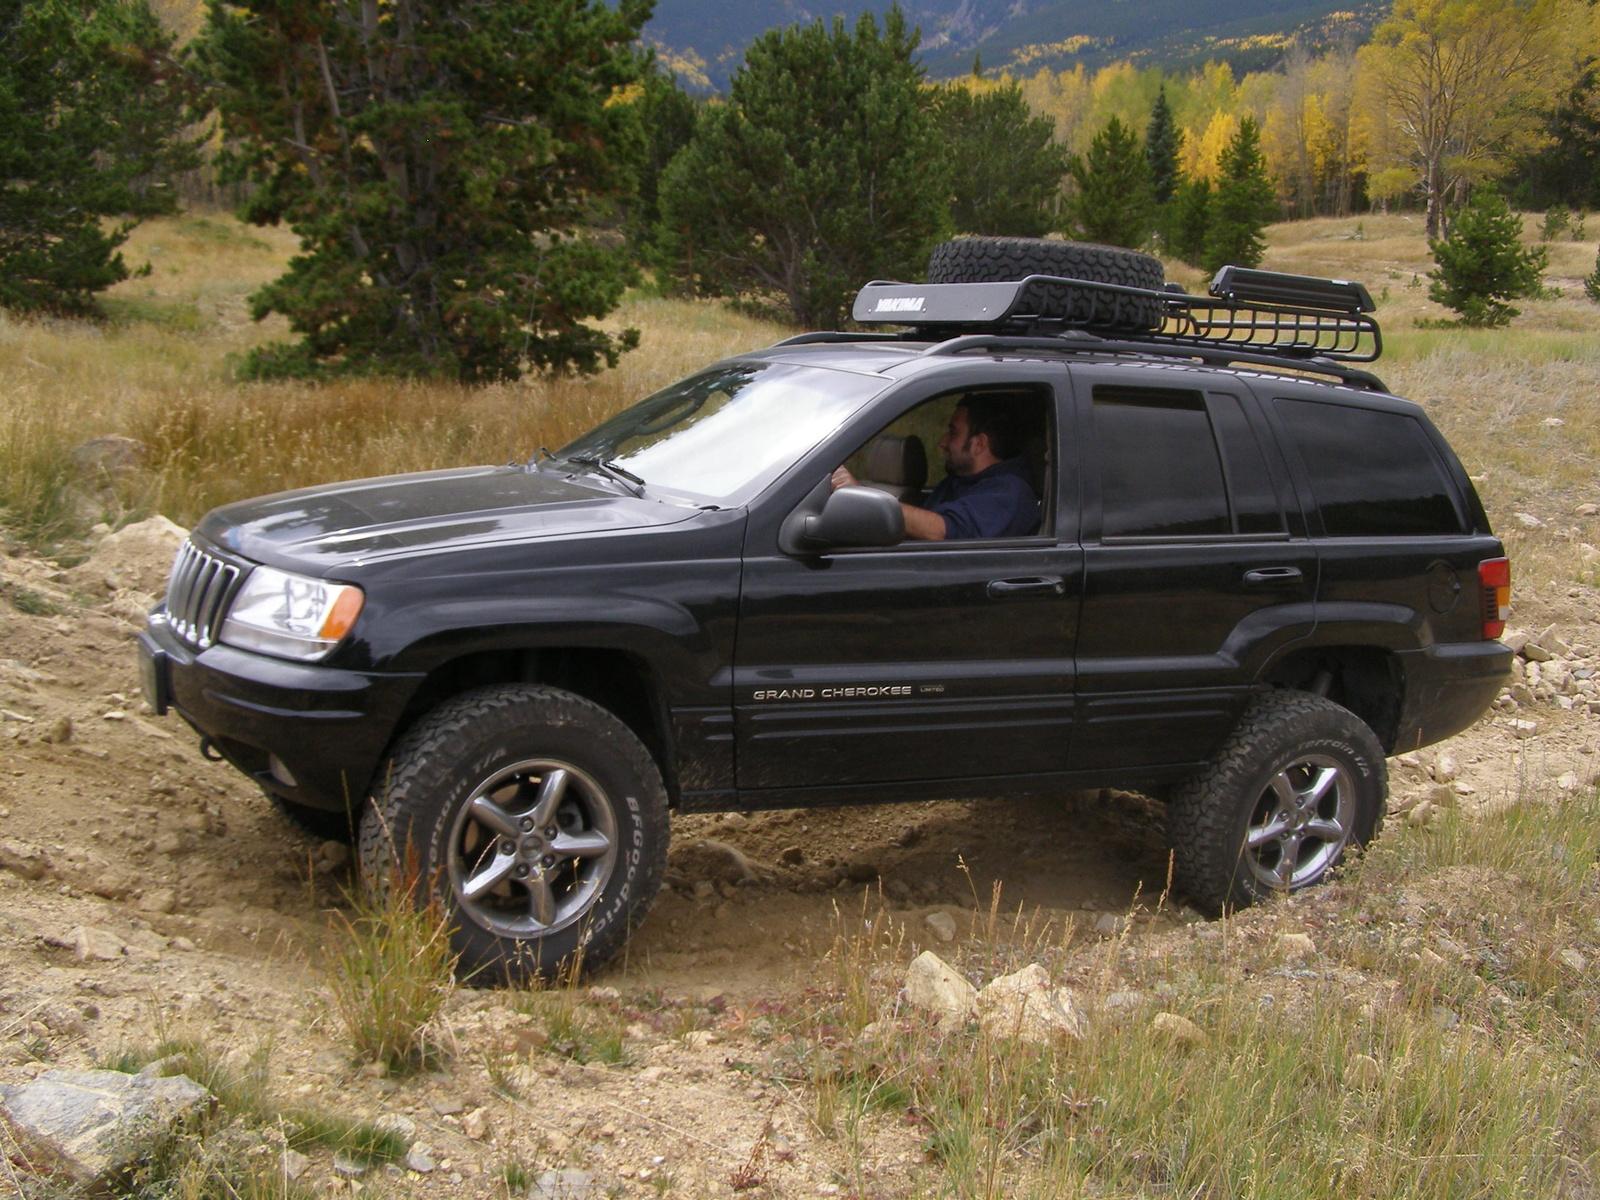 wiring diagram for 2002 jeep grand cherokee laredo vw tiguan radio limited engine